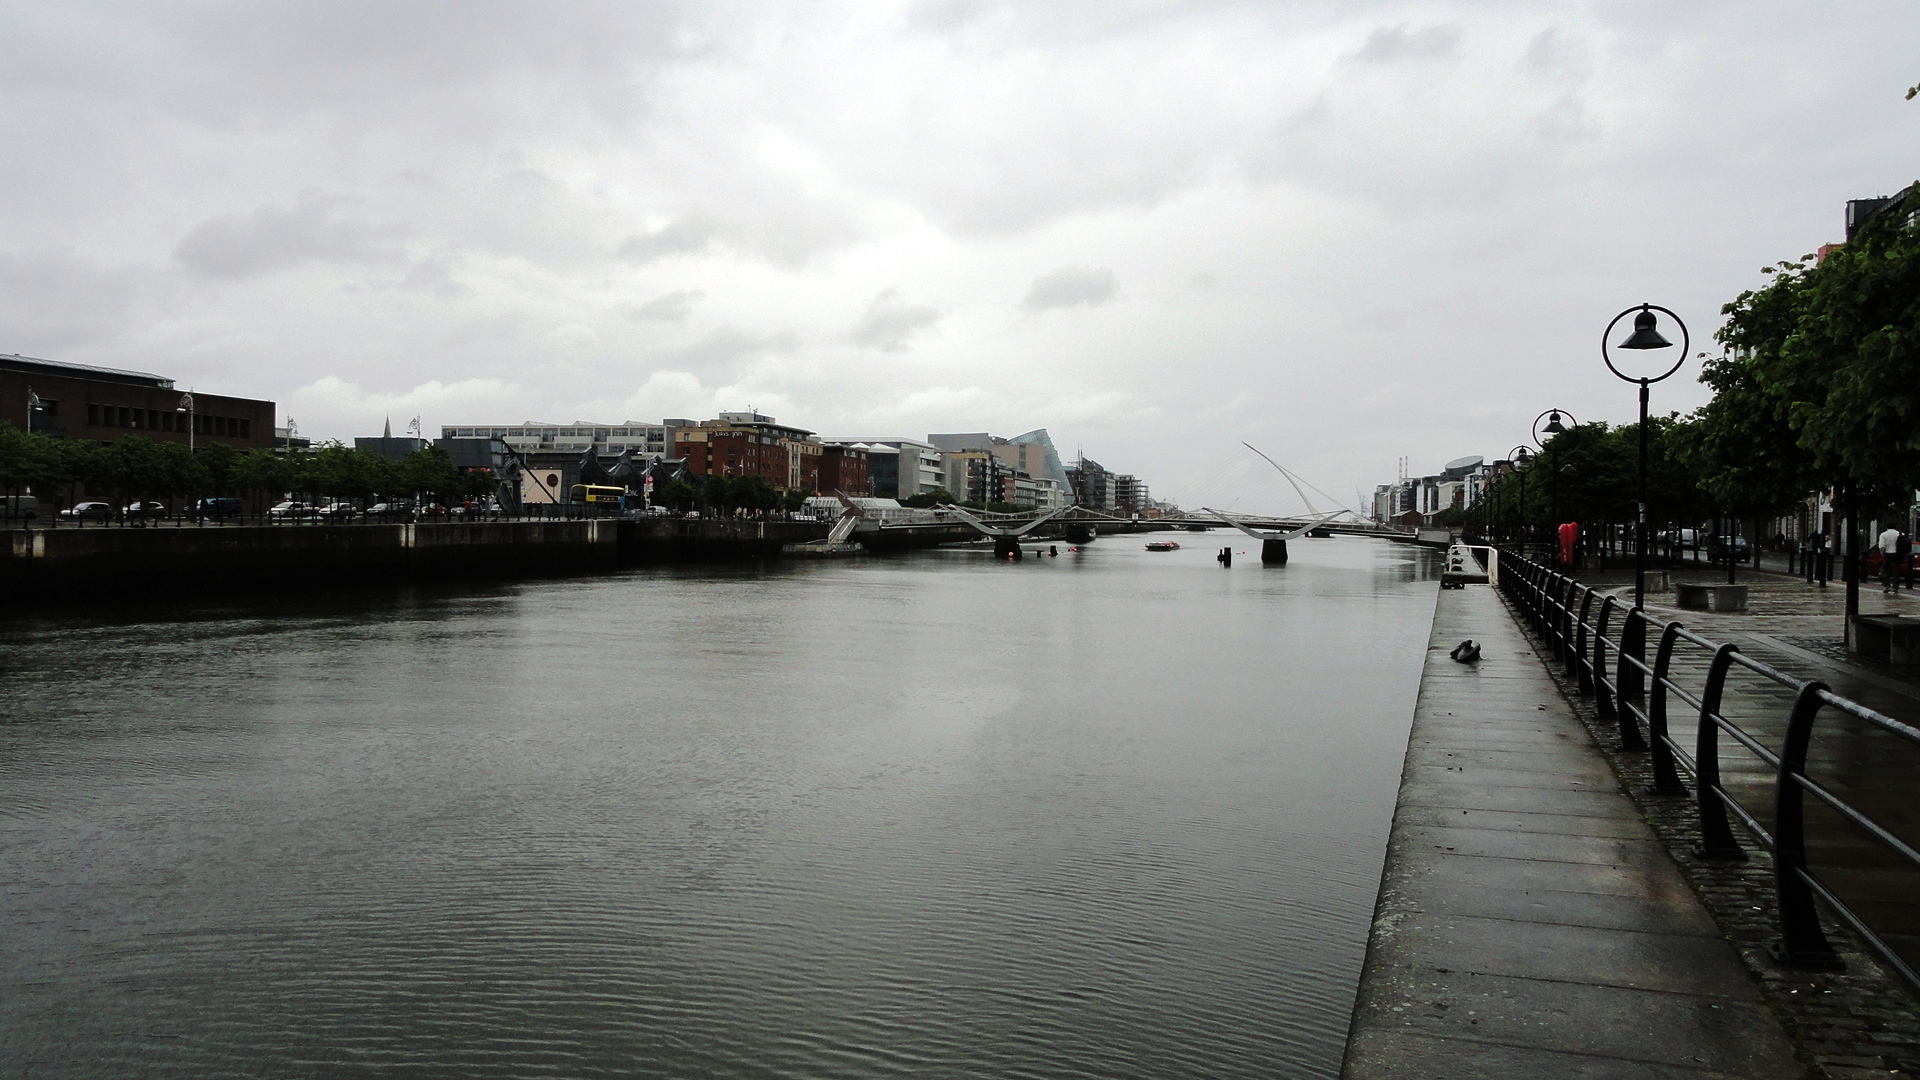 Dublin - Balade le long de la Liffey